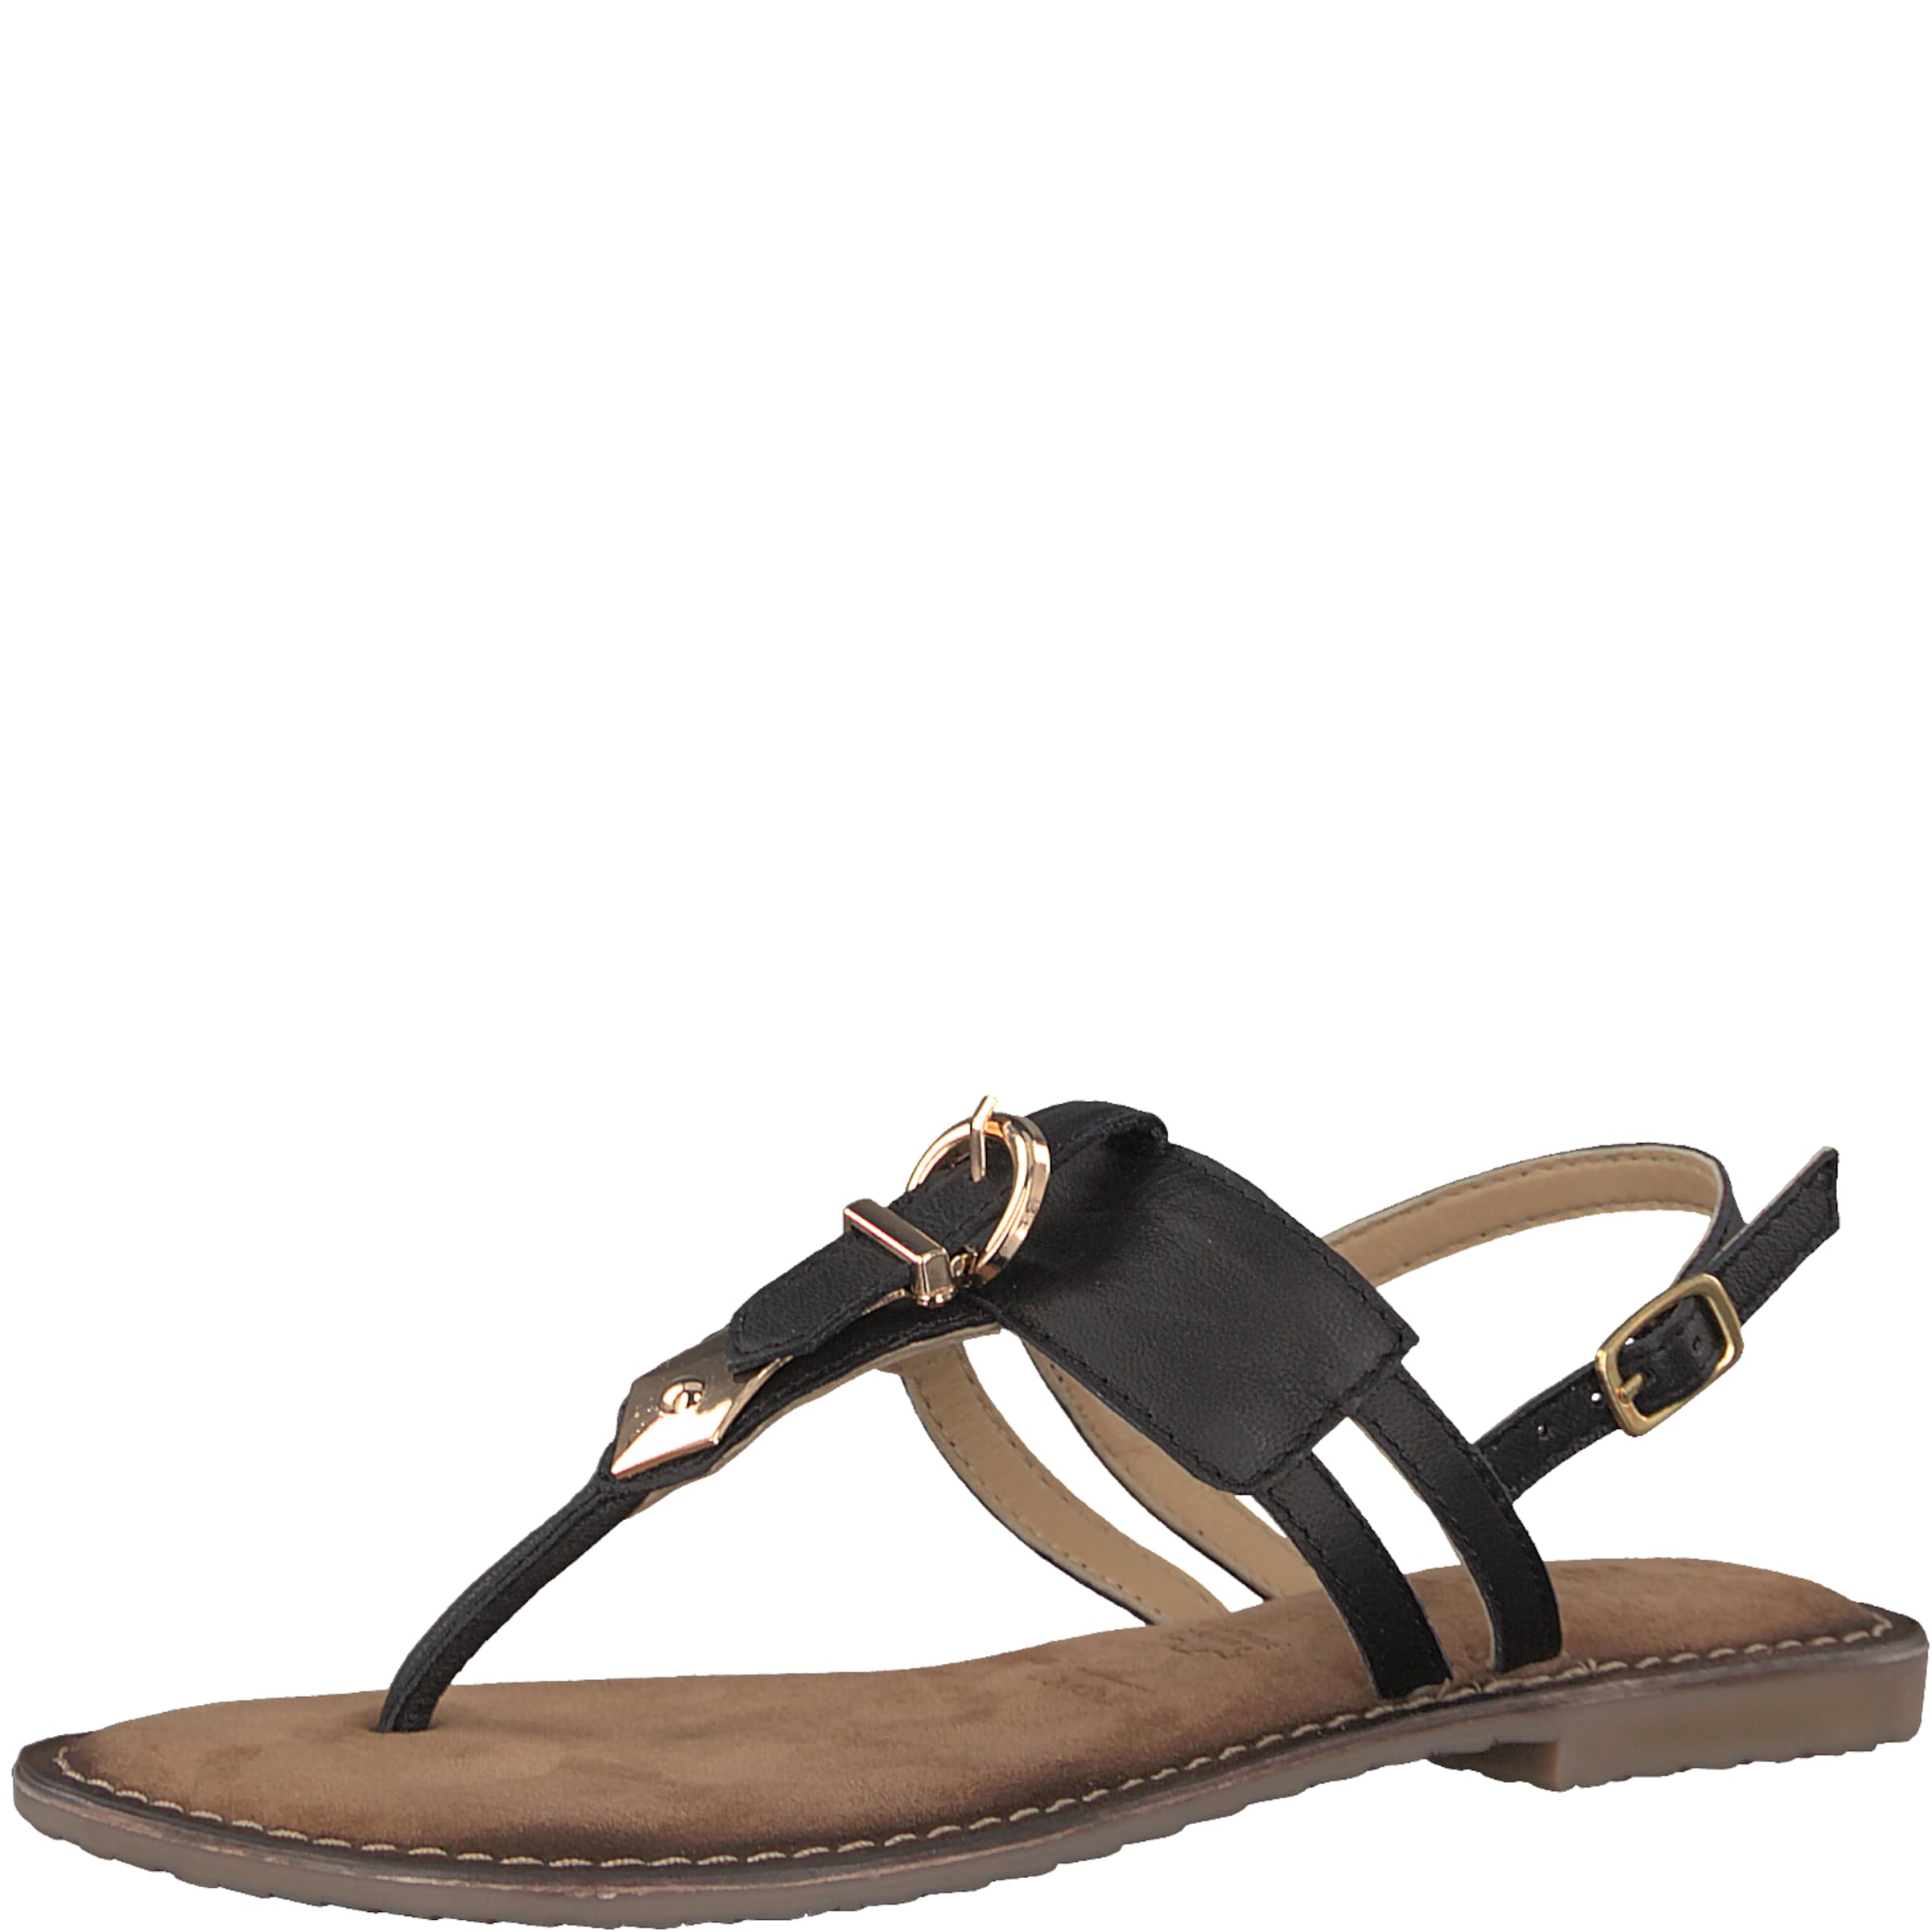 TAMARIS Zehentrenner Sandale Sandale Zehentrenner Günstige und langlebige Schuhe e18989